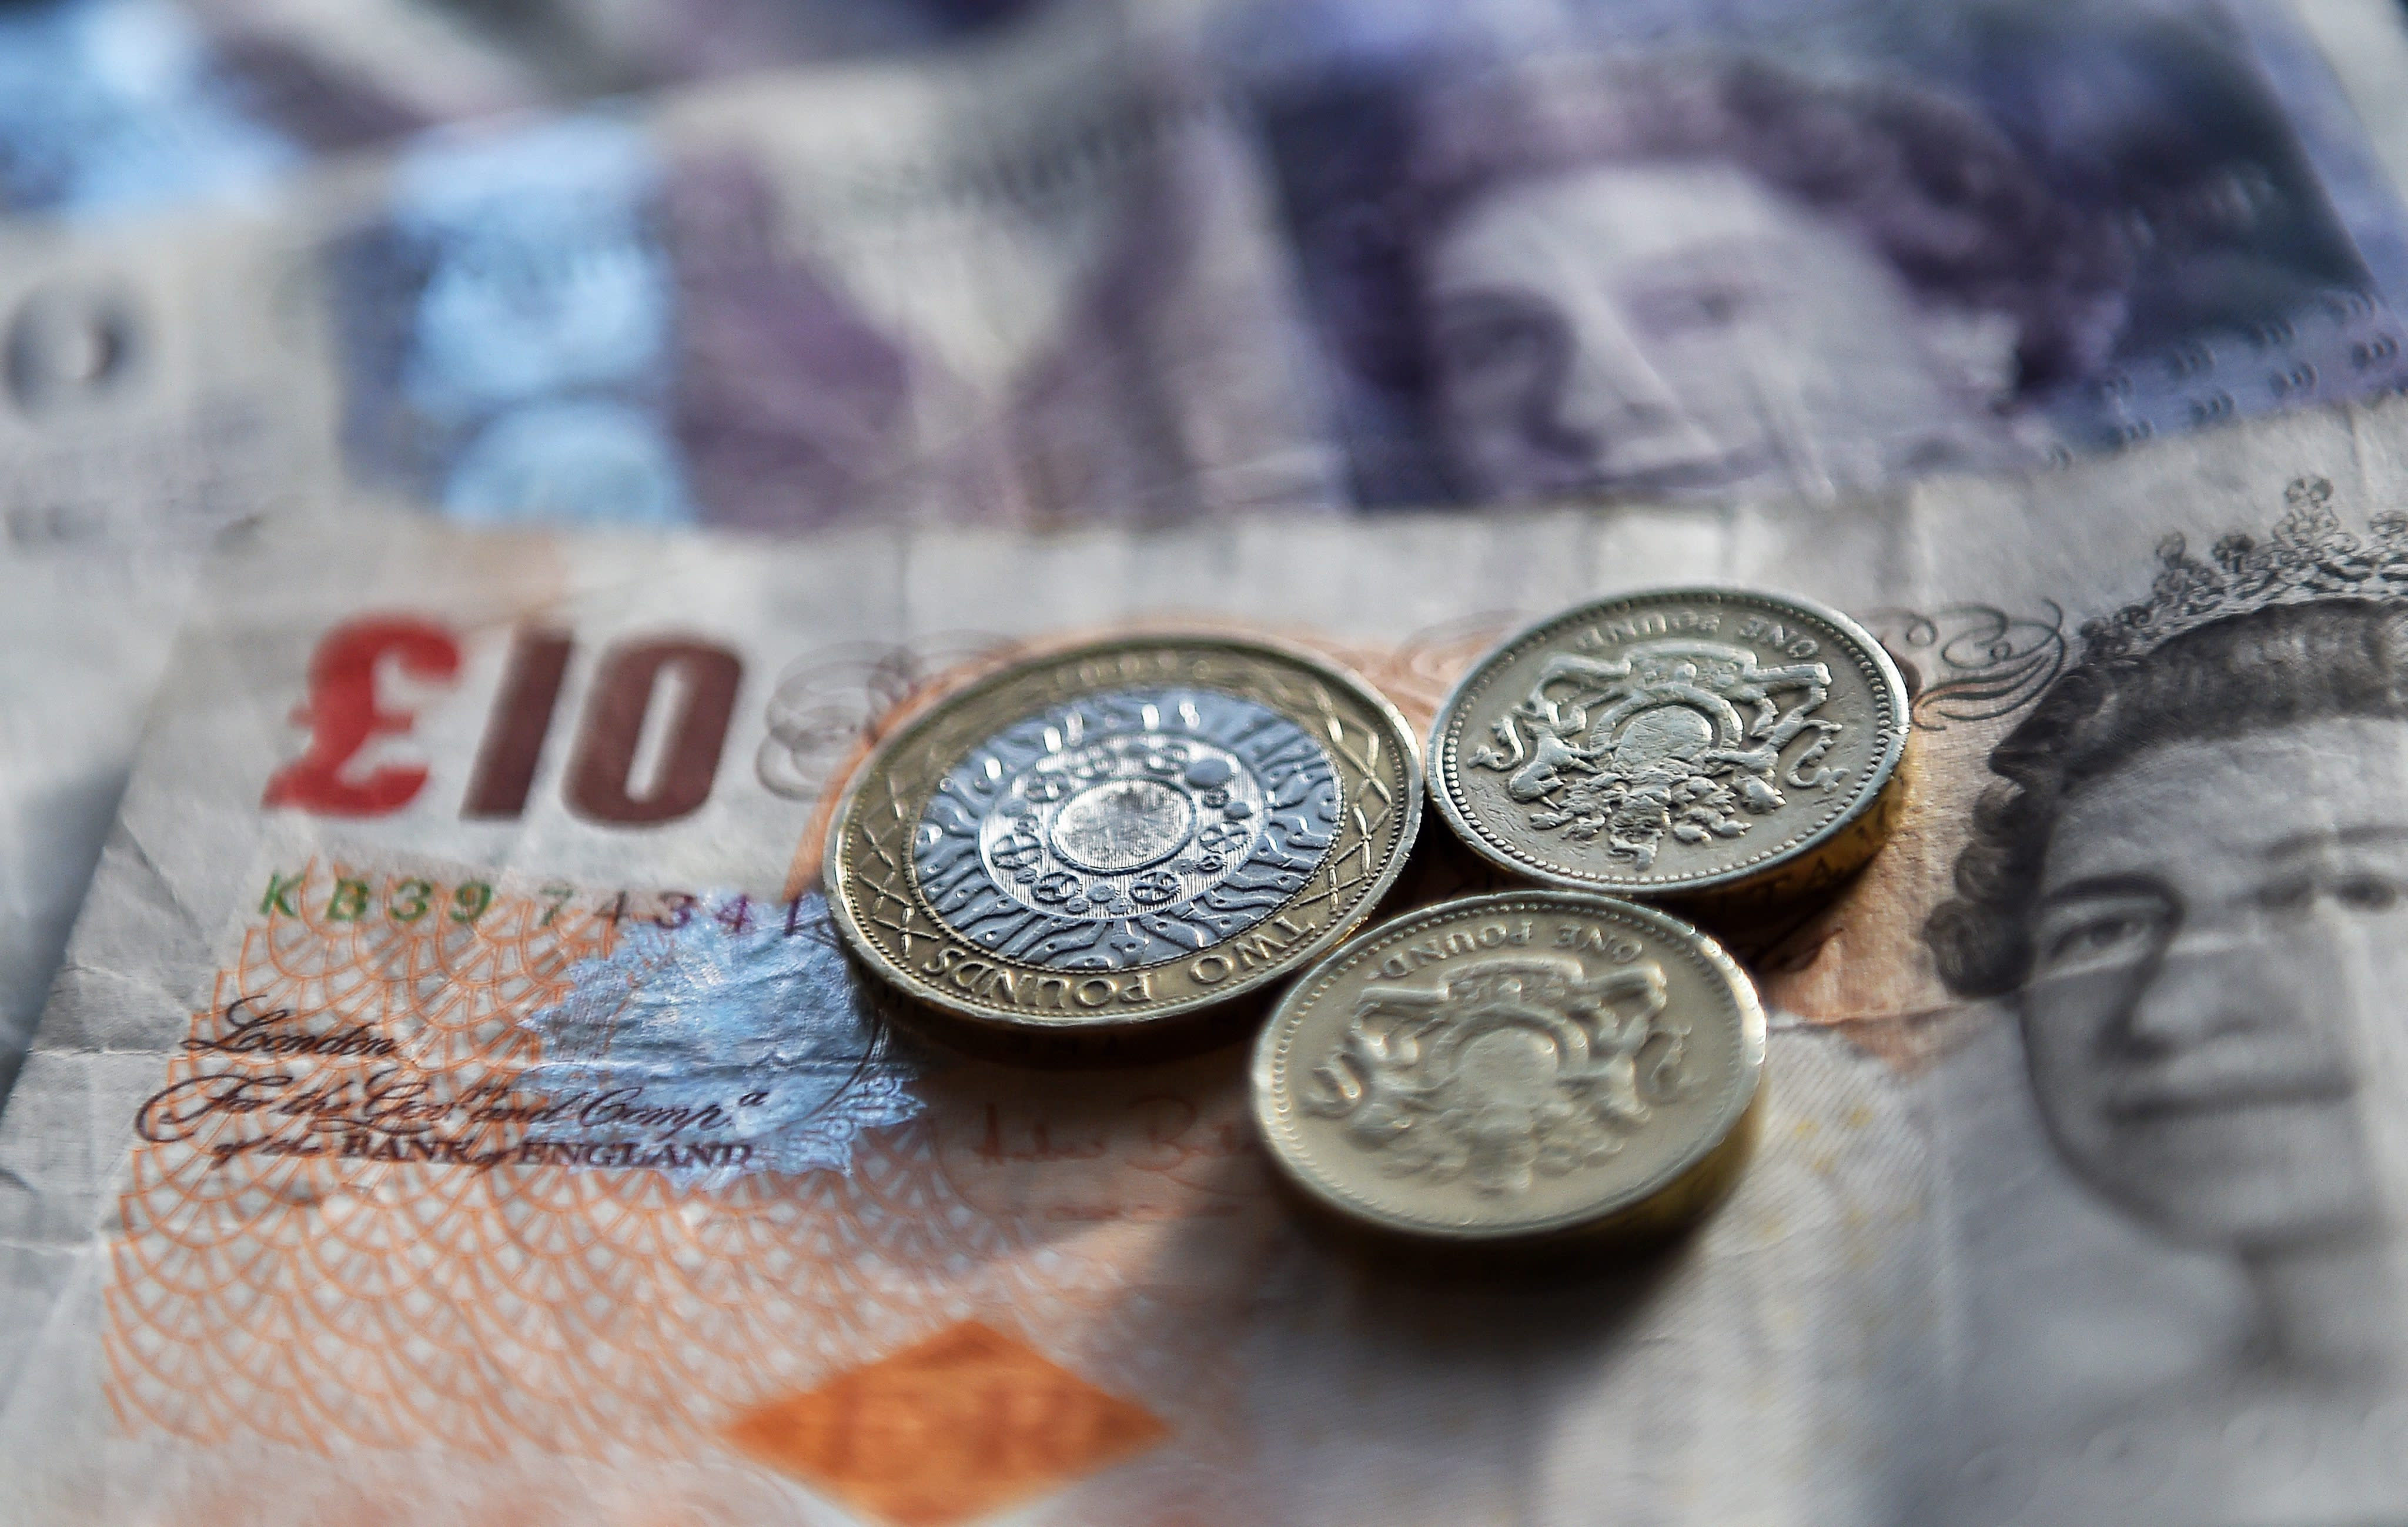 Civitas targets asset management partners as it hits £2bn